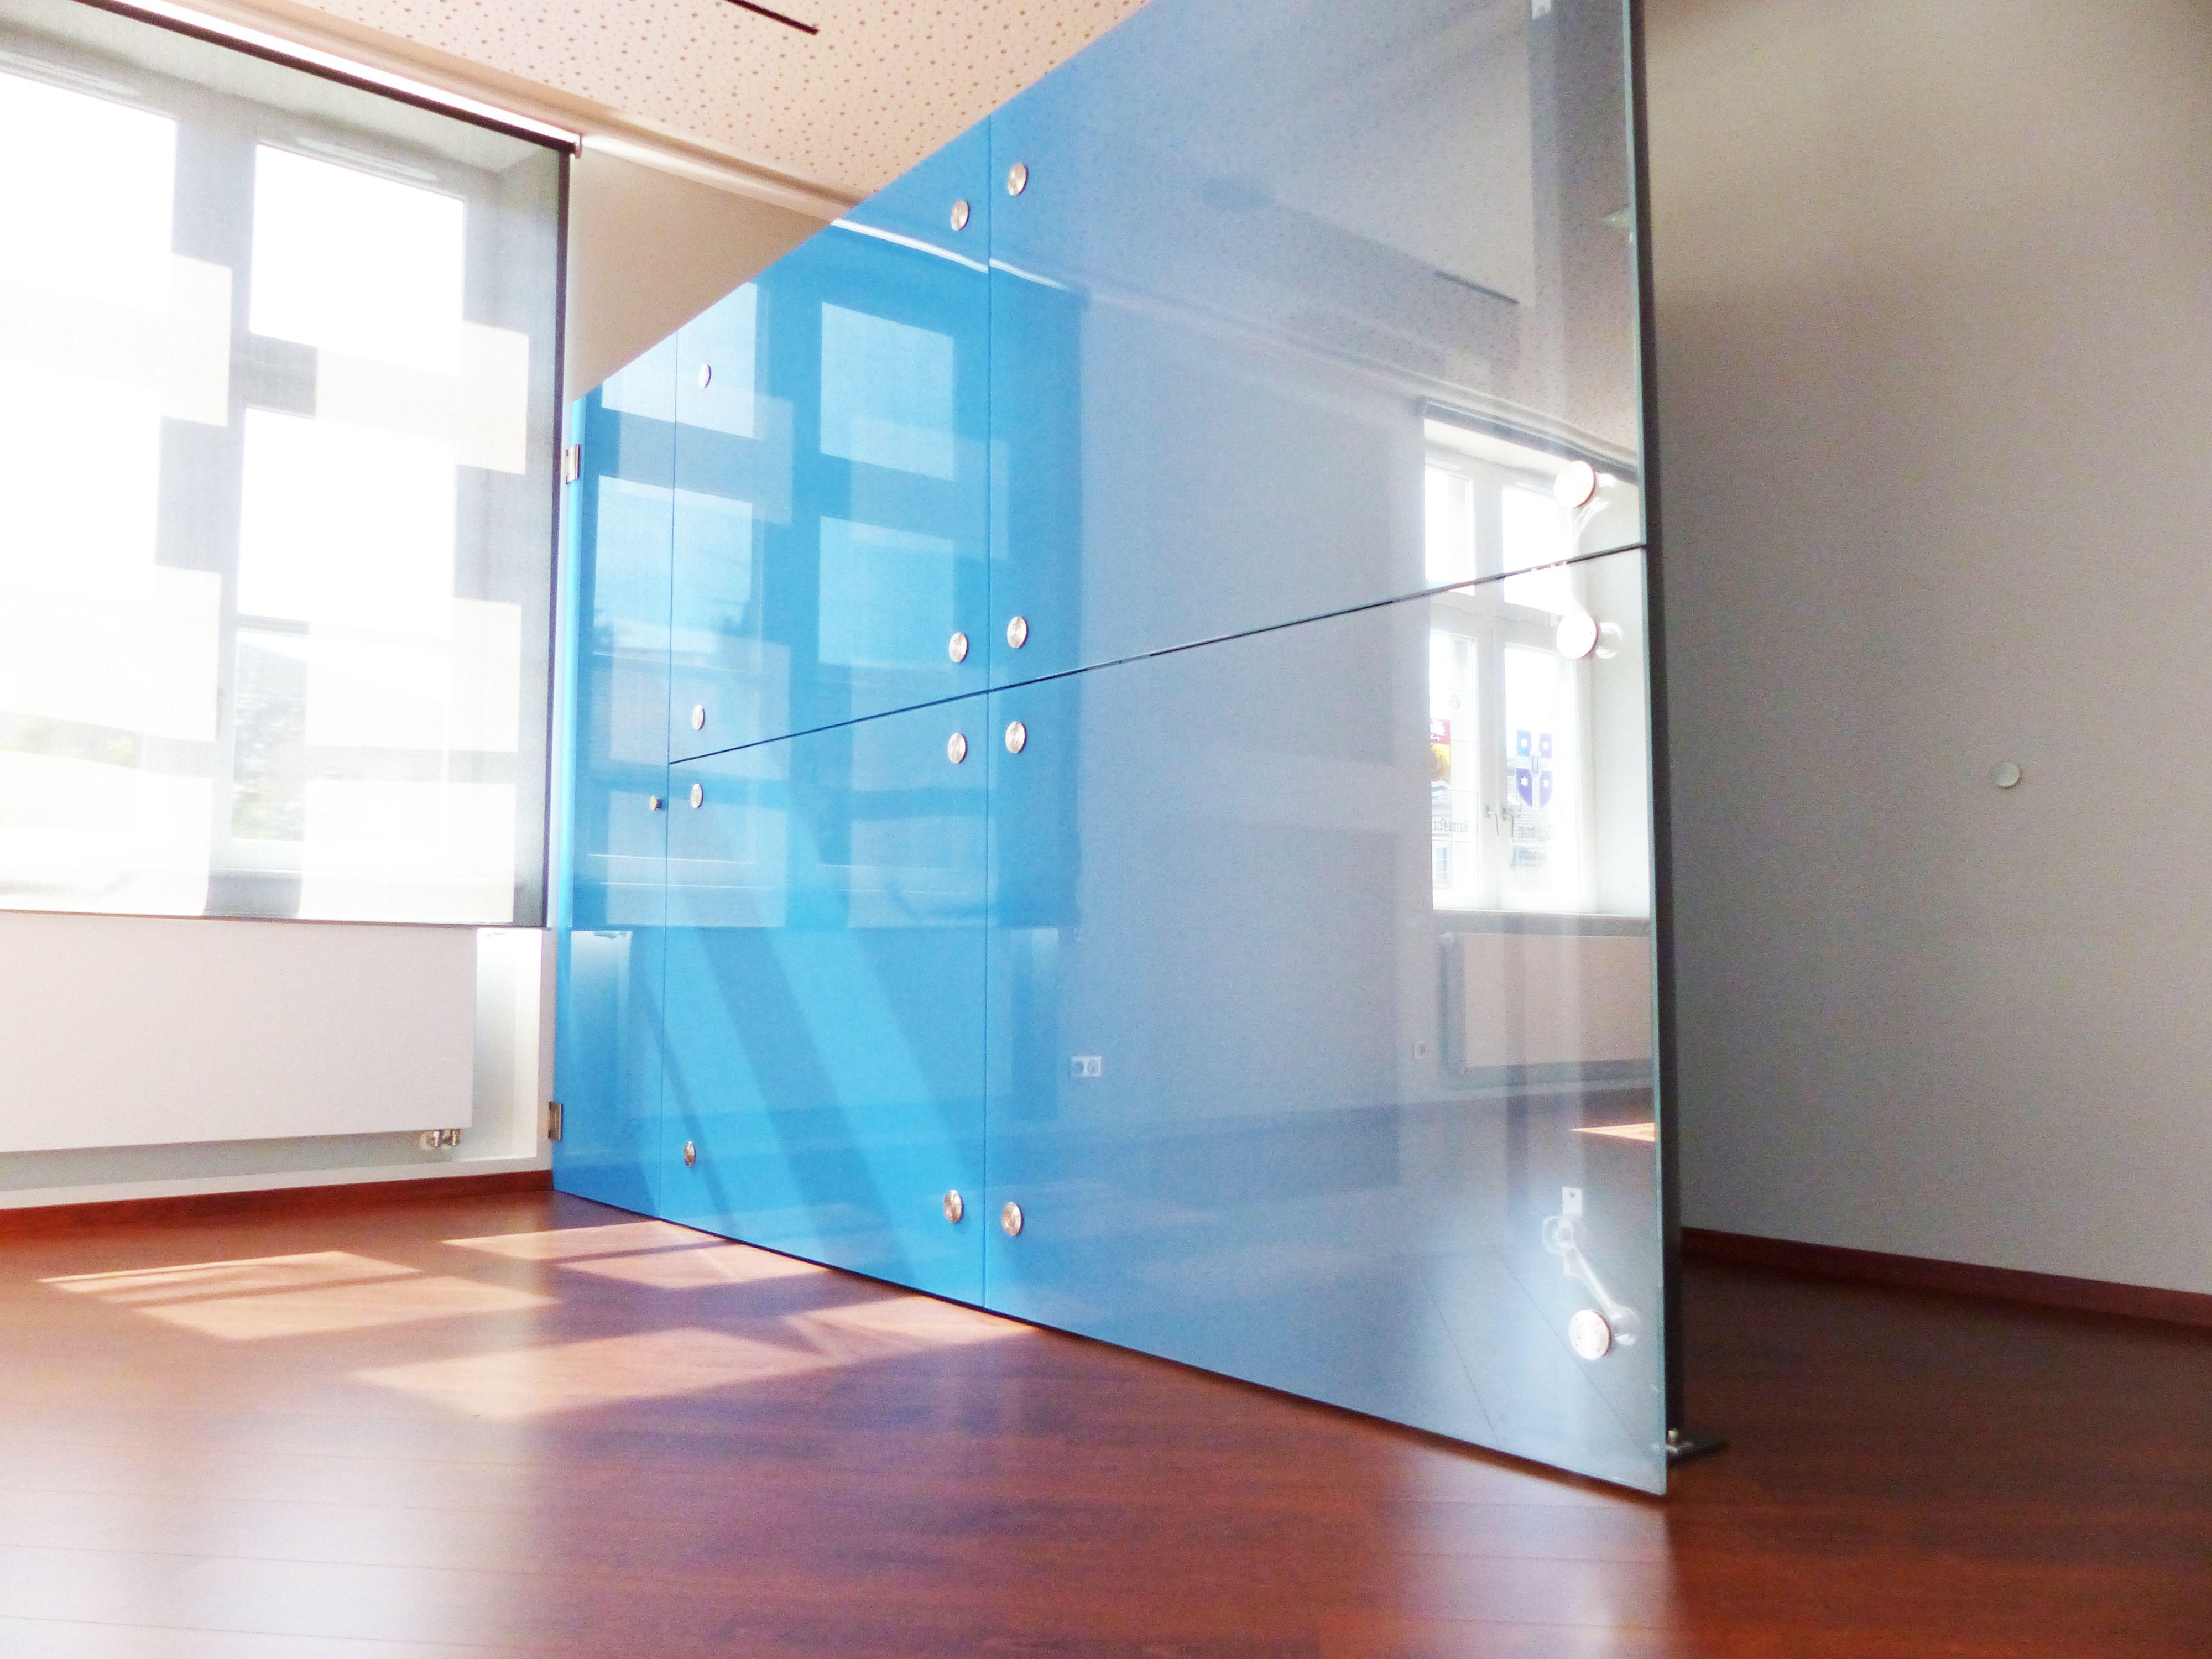 cloison en verre feuillet avec insertion film couleur partition glass made from decorative. Black Bedroom Furniture Sets. Home Design Ideas